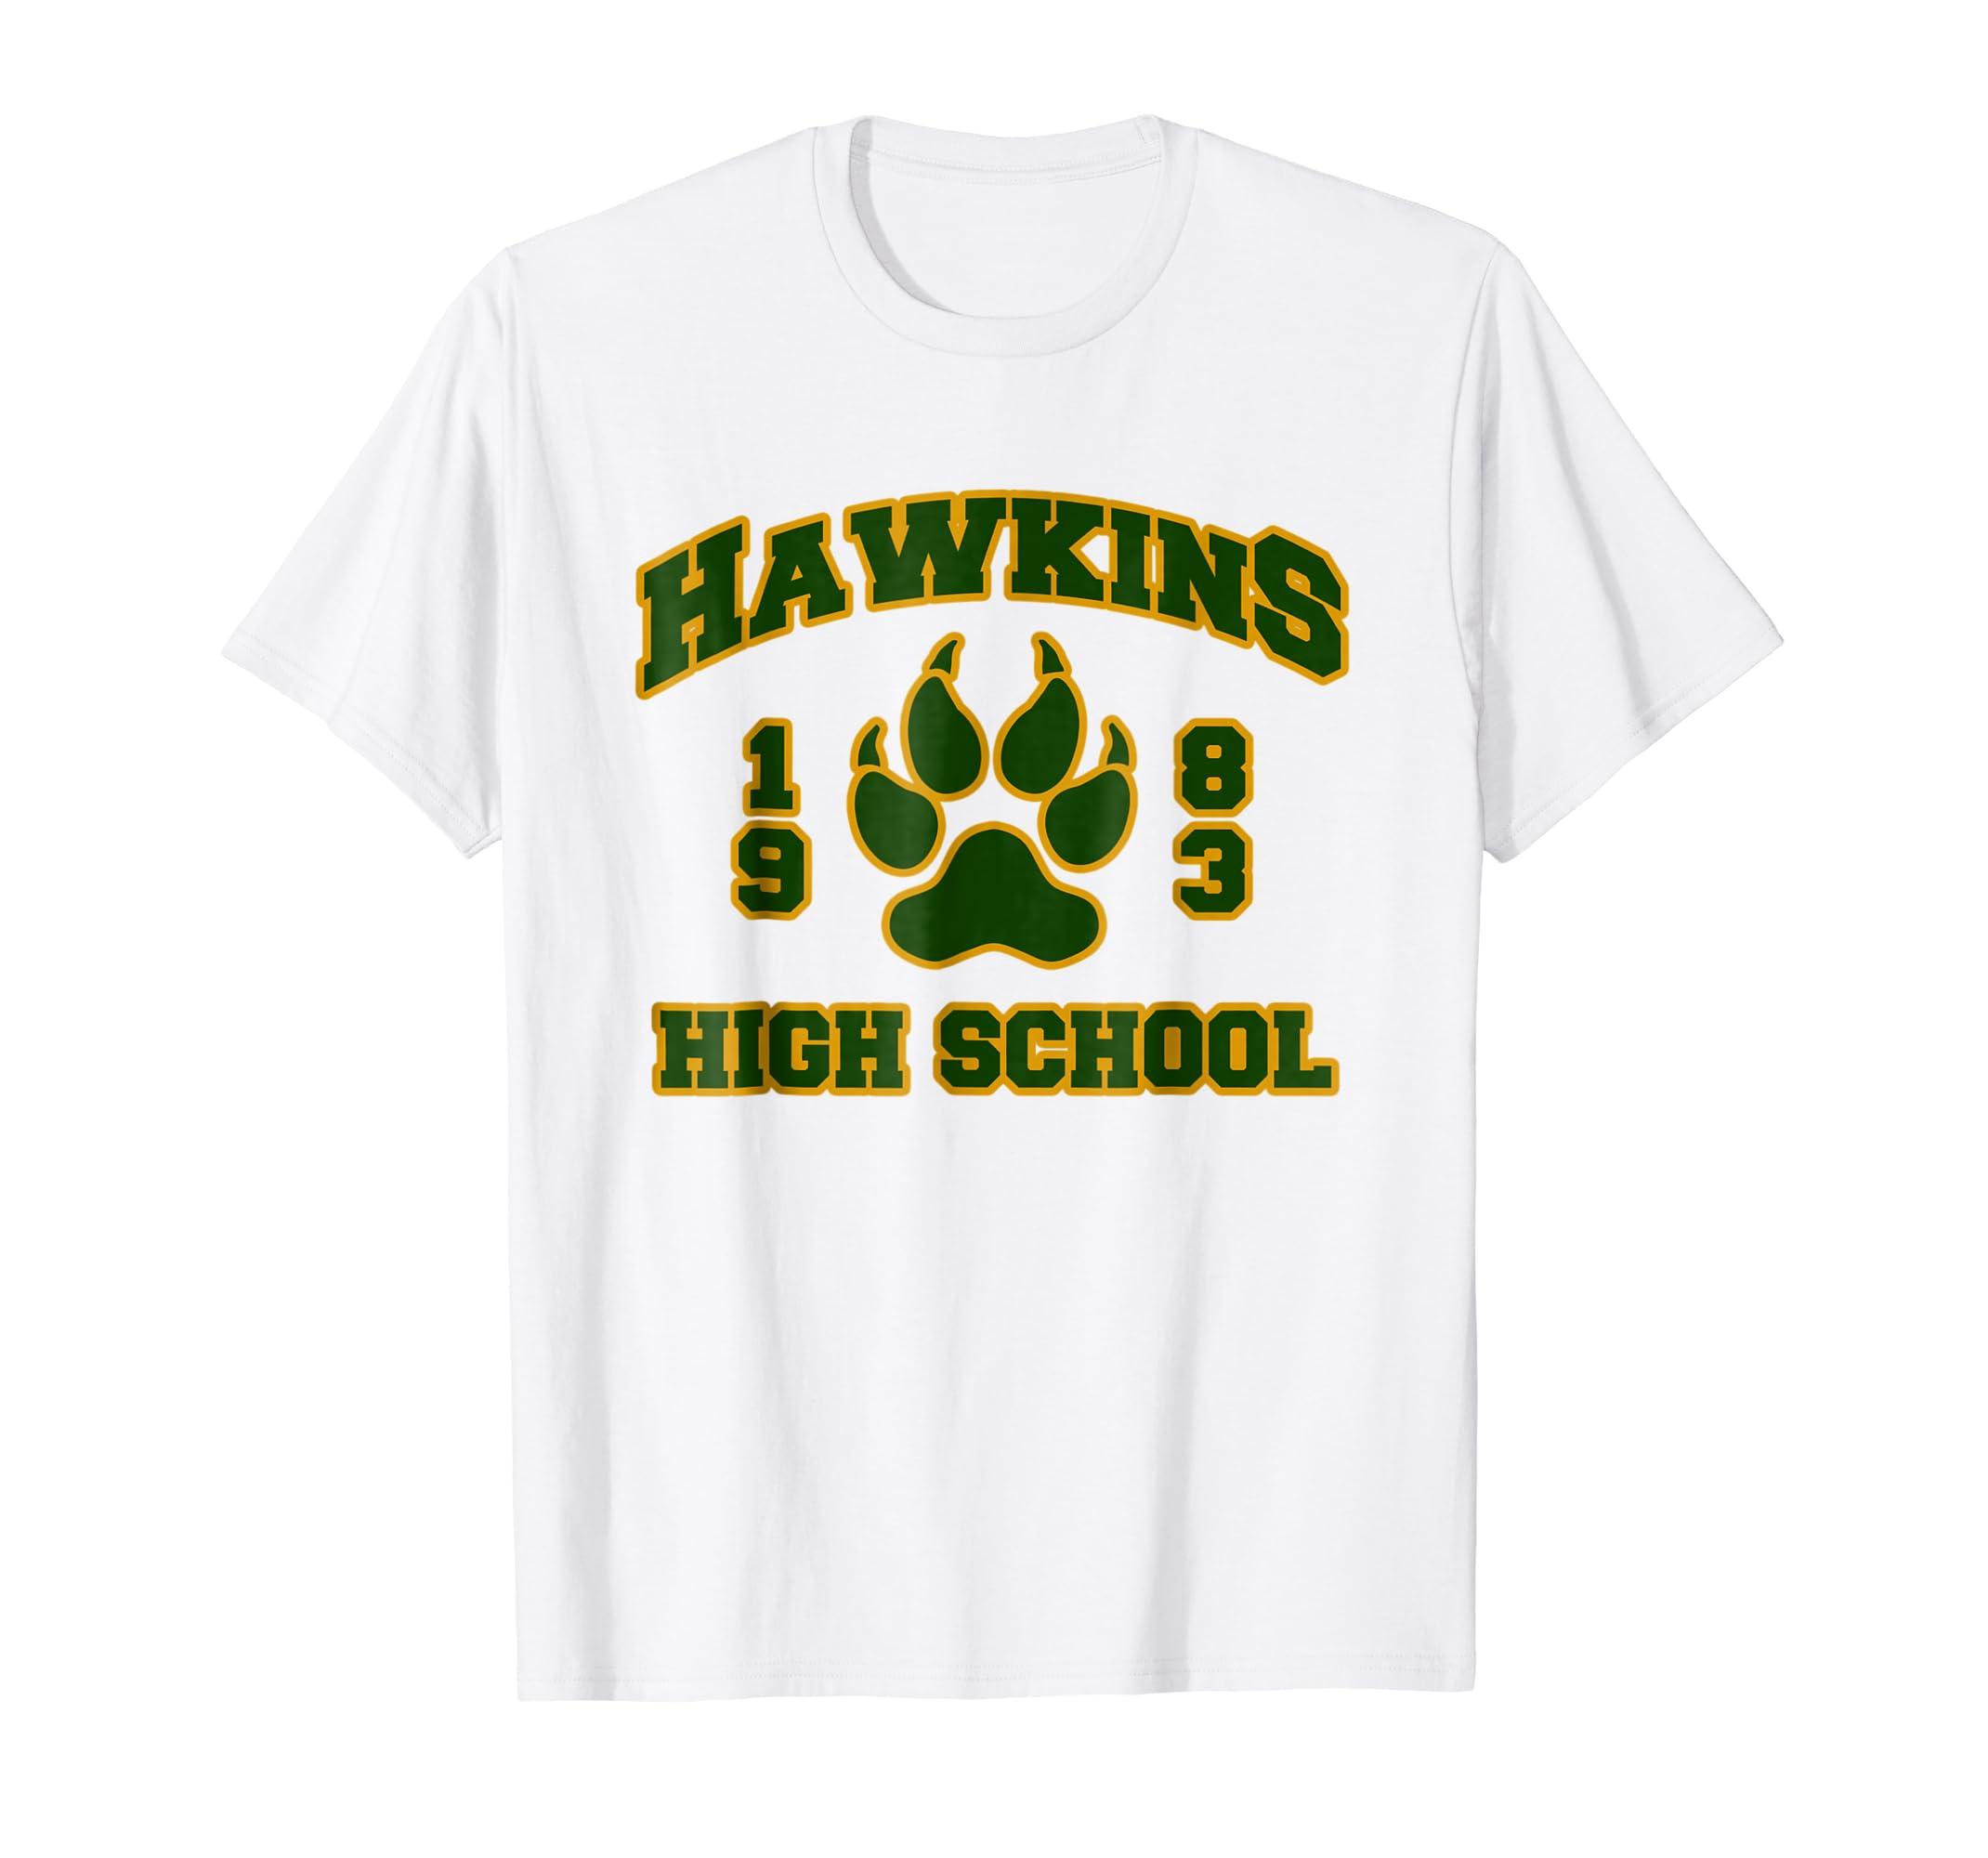 Amazon Hawkins High School Retro 80s Style School T Shirt